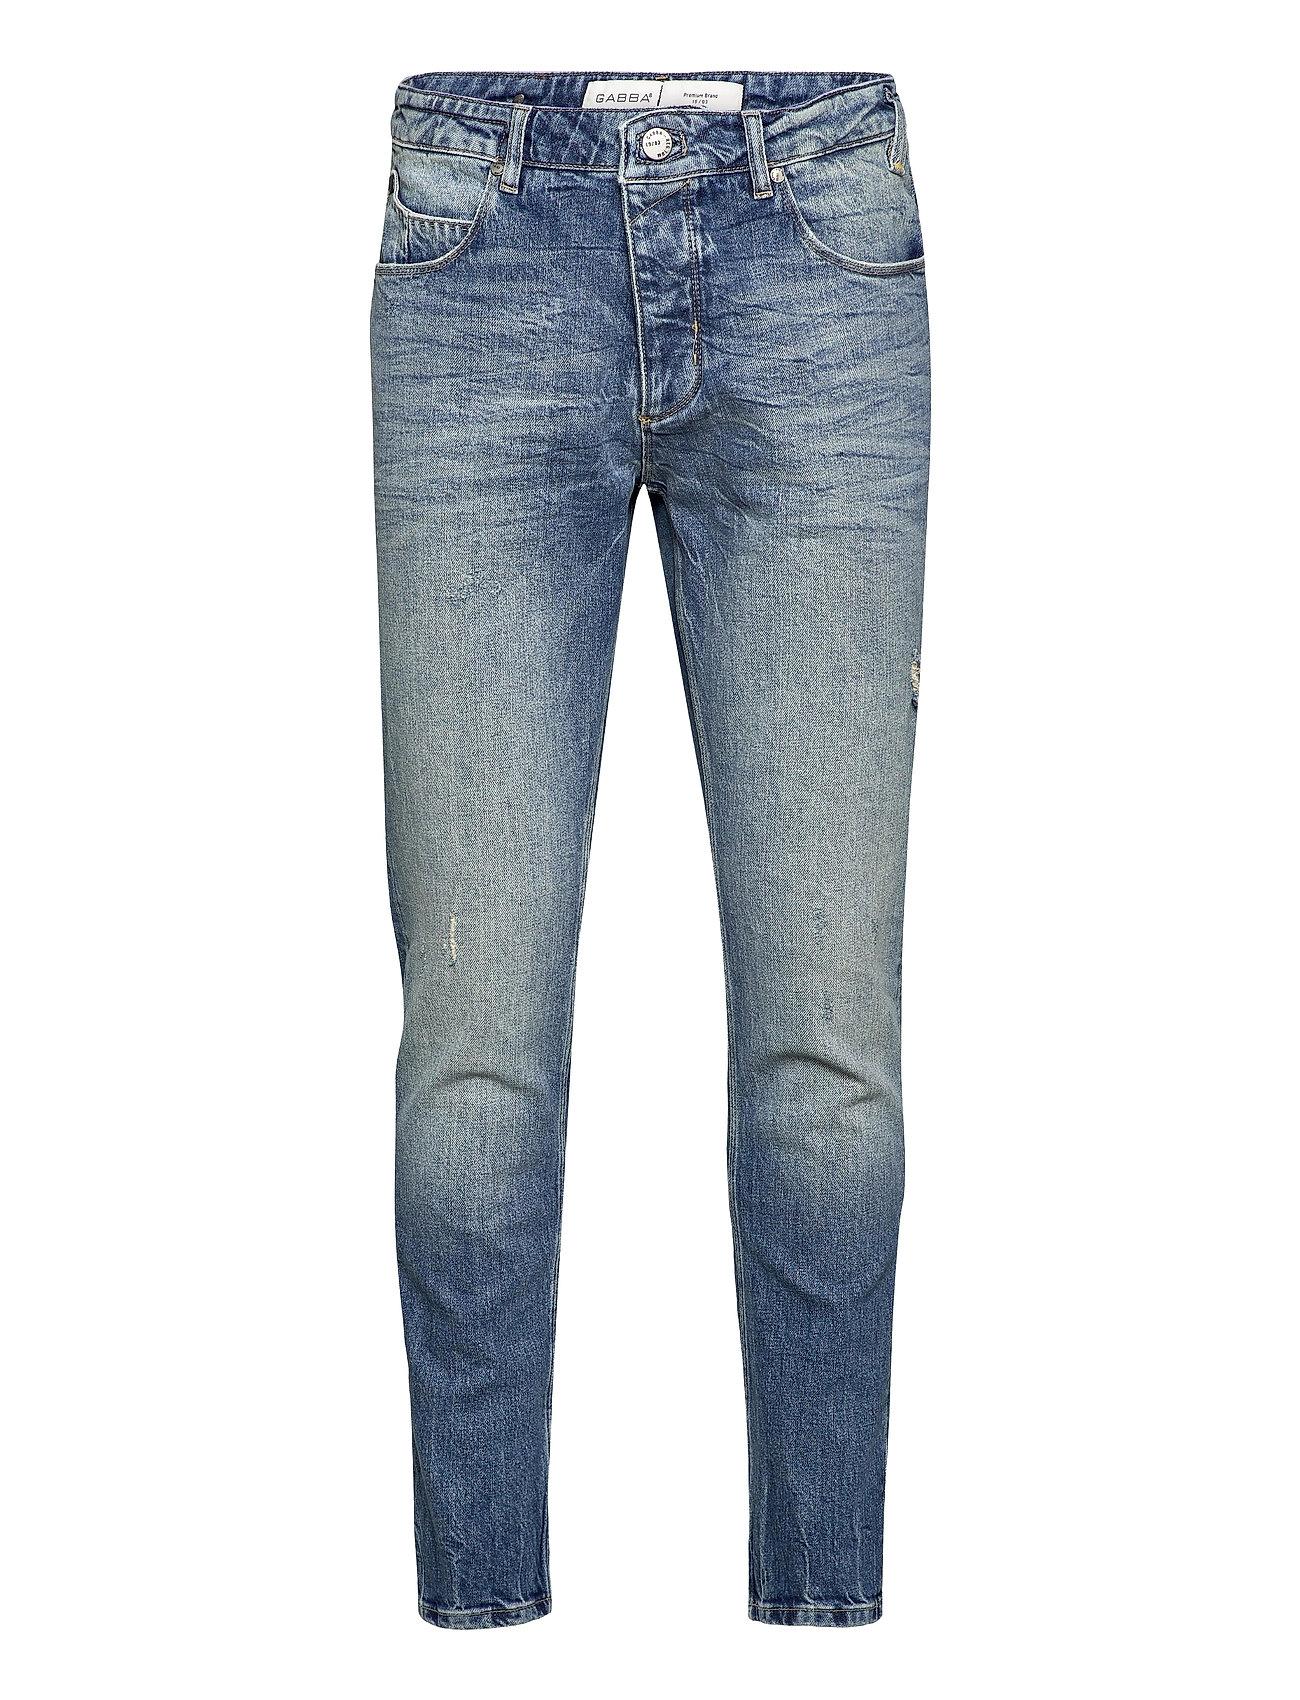 Image of Rey K3830 Jeans Slim Jeans Blå Gabba (3496015117)